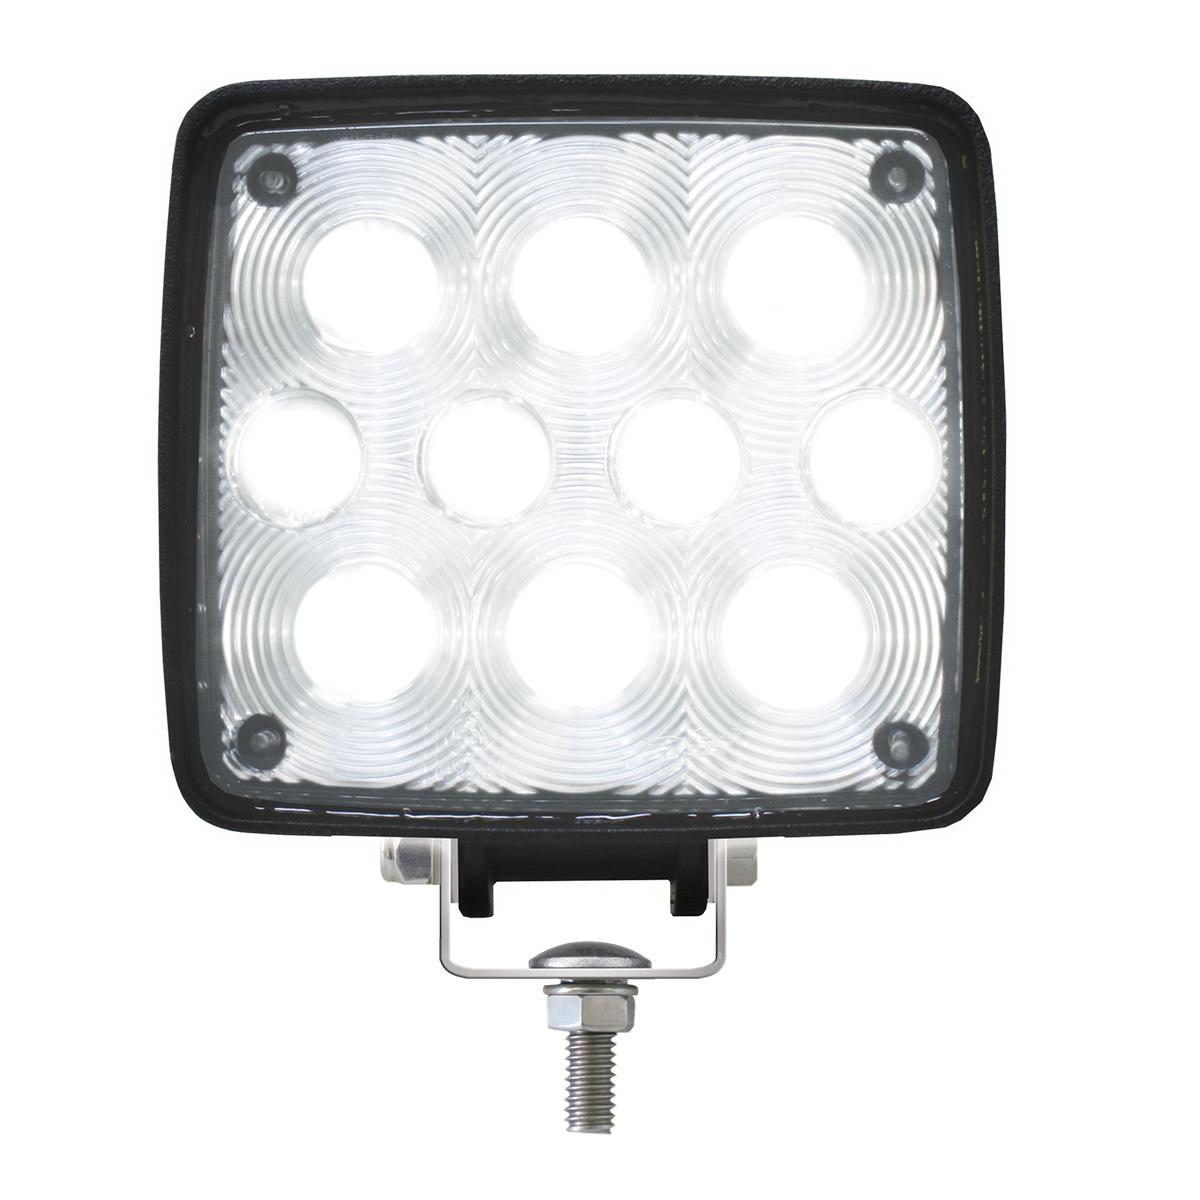 76354 Medium High Power LED Work Light